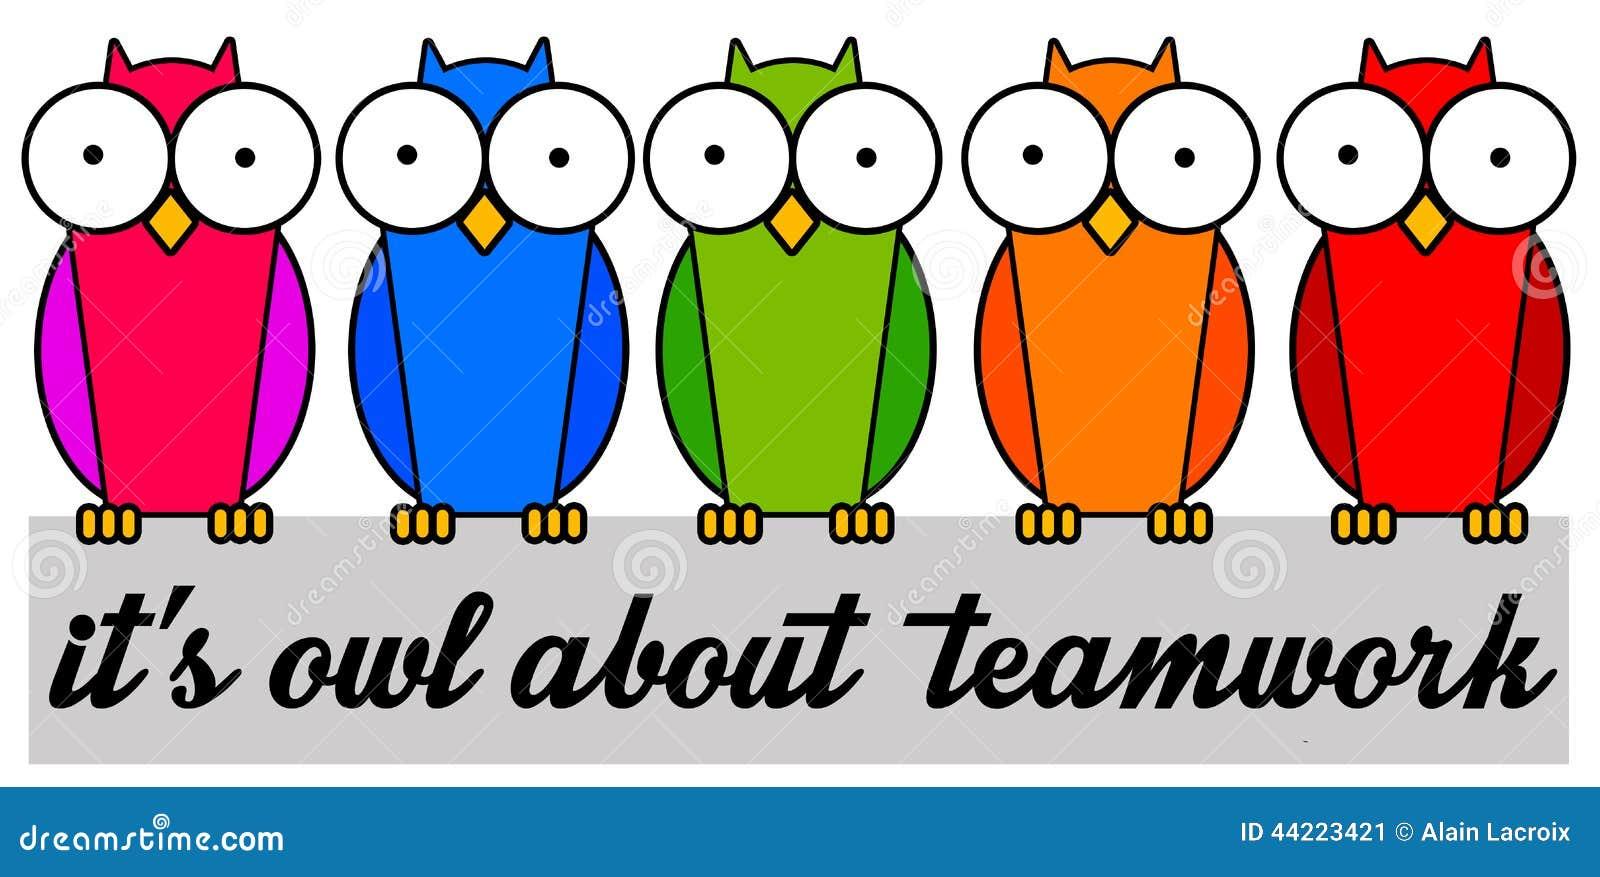 All about teamwork stock illustration. Illustration of ...